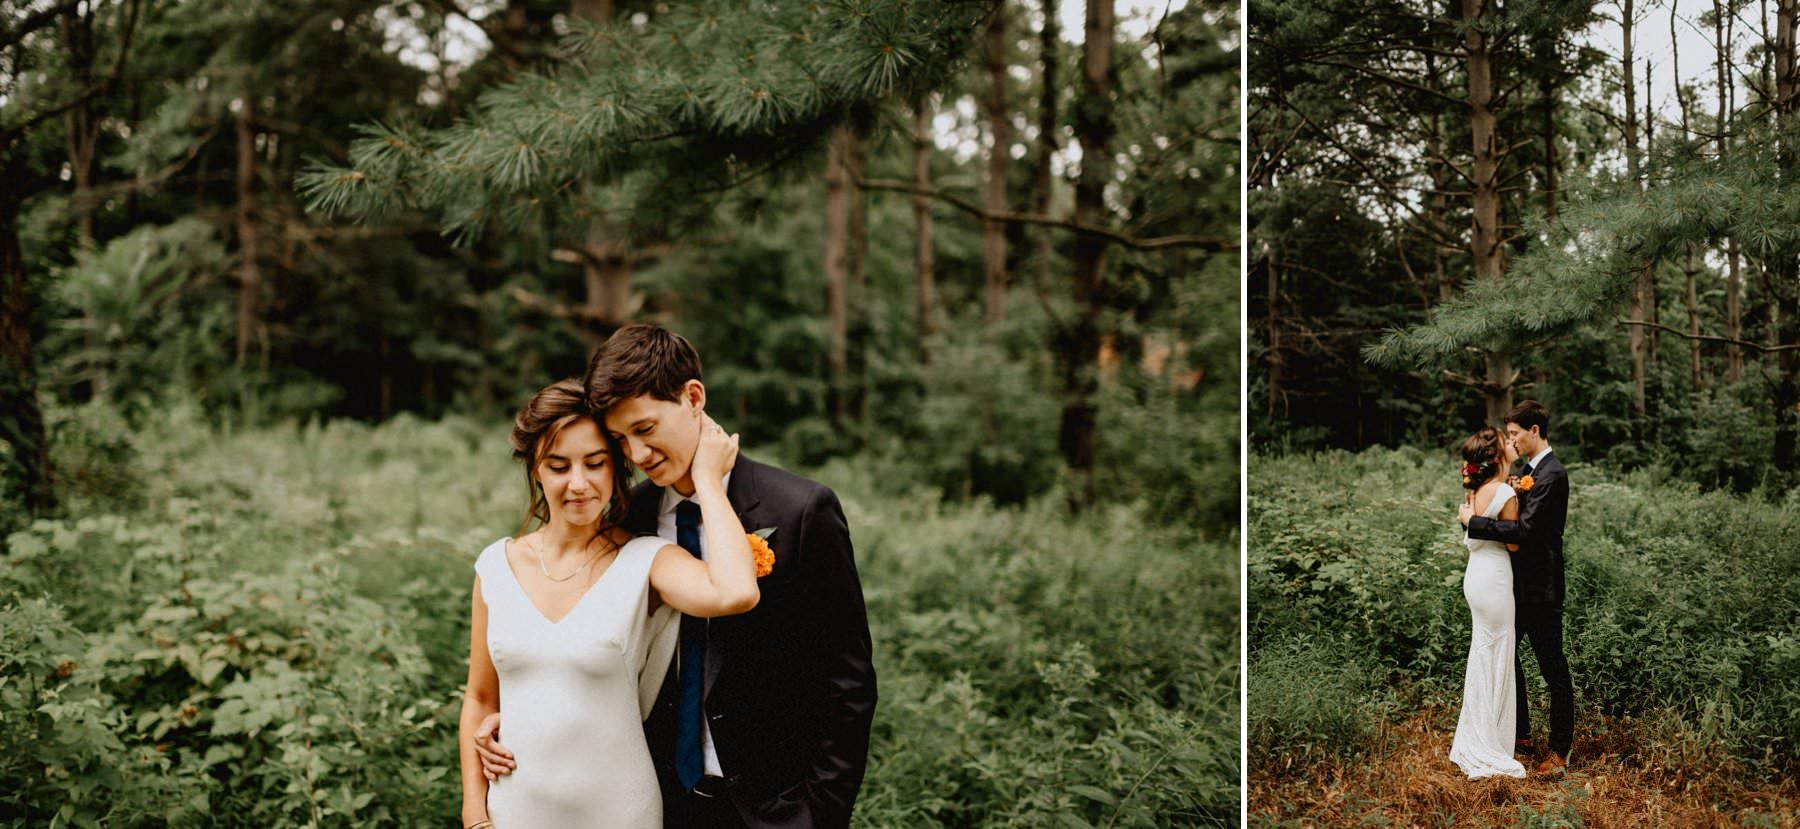 pennsylvania-private-estate-wedding-49.jpg